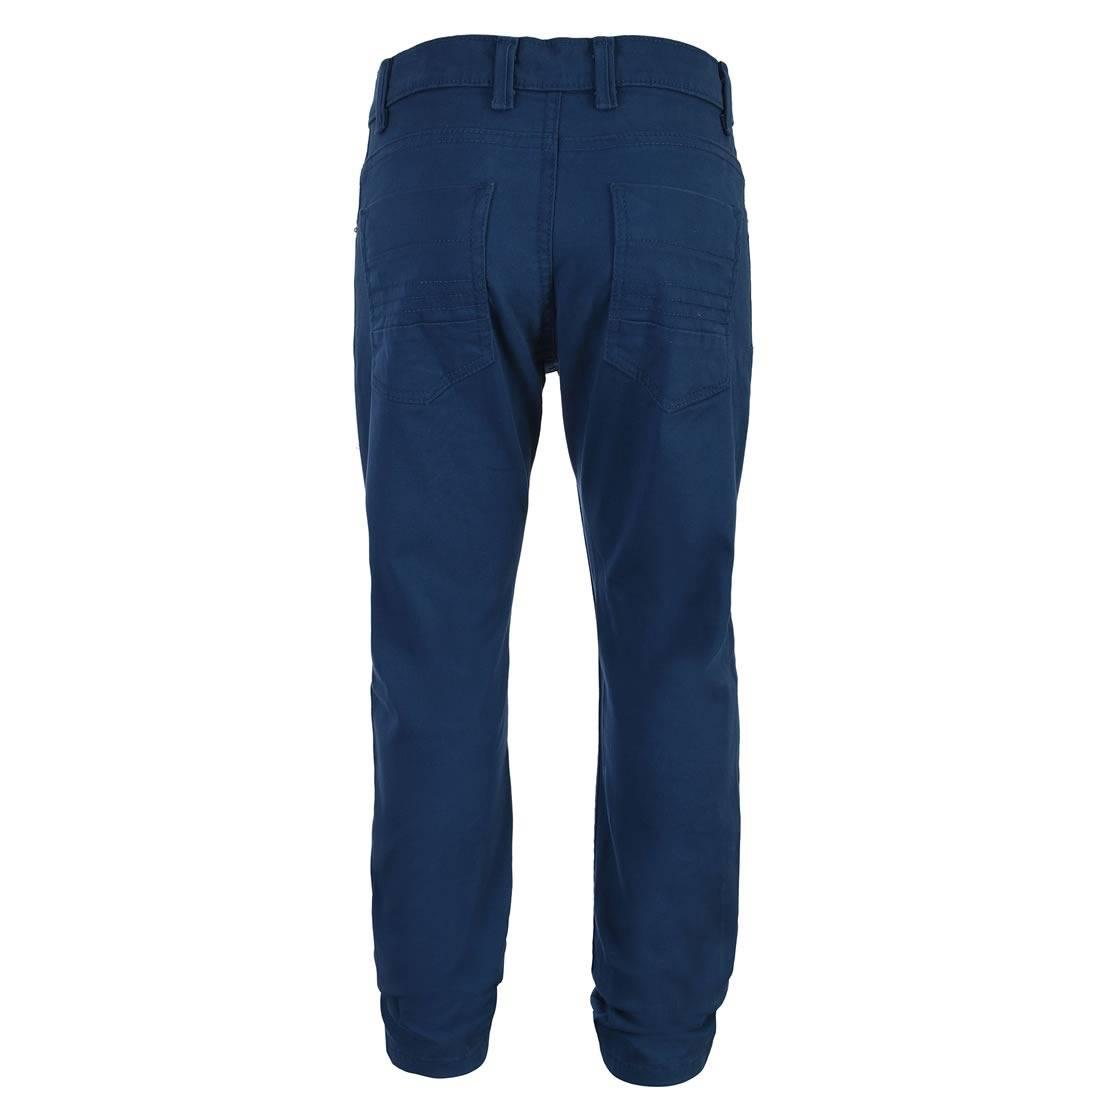 021109065414-02-Pantalon-Vaquero-Boys-Gabardina-Con-Elastano-Skinny-Fit-Cintura-Ajustable-Azul-Plumbago-yale